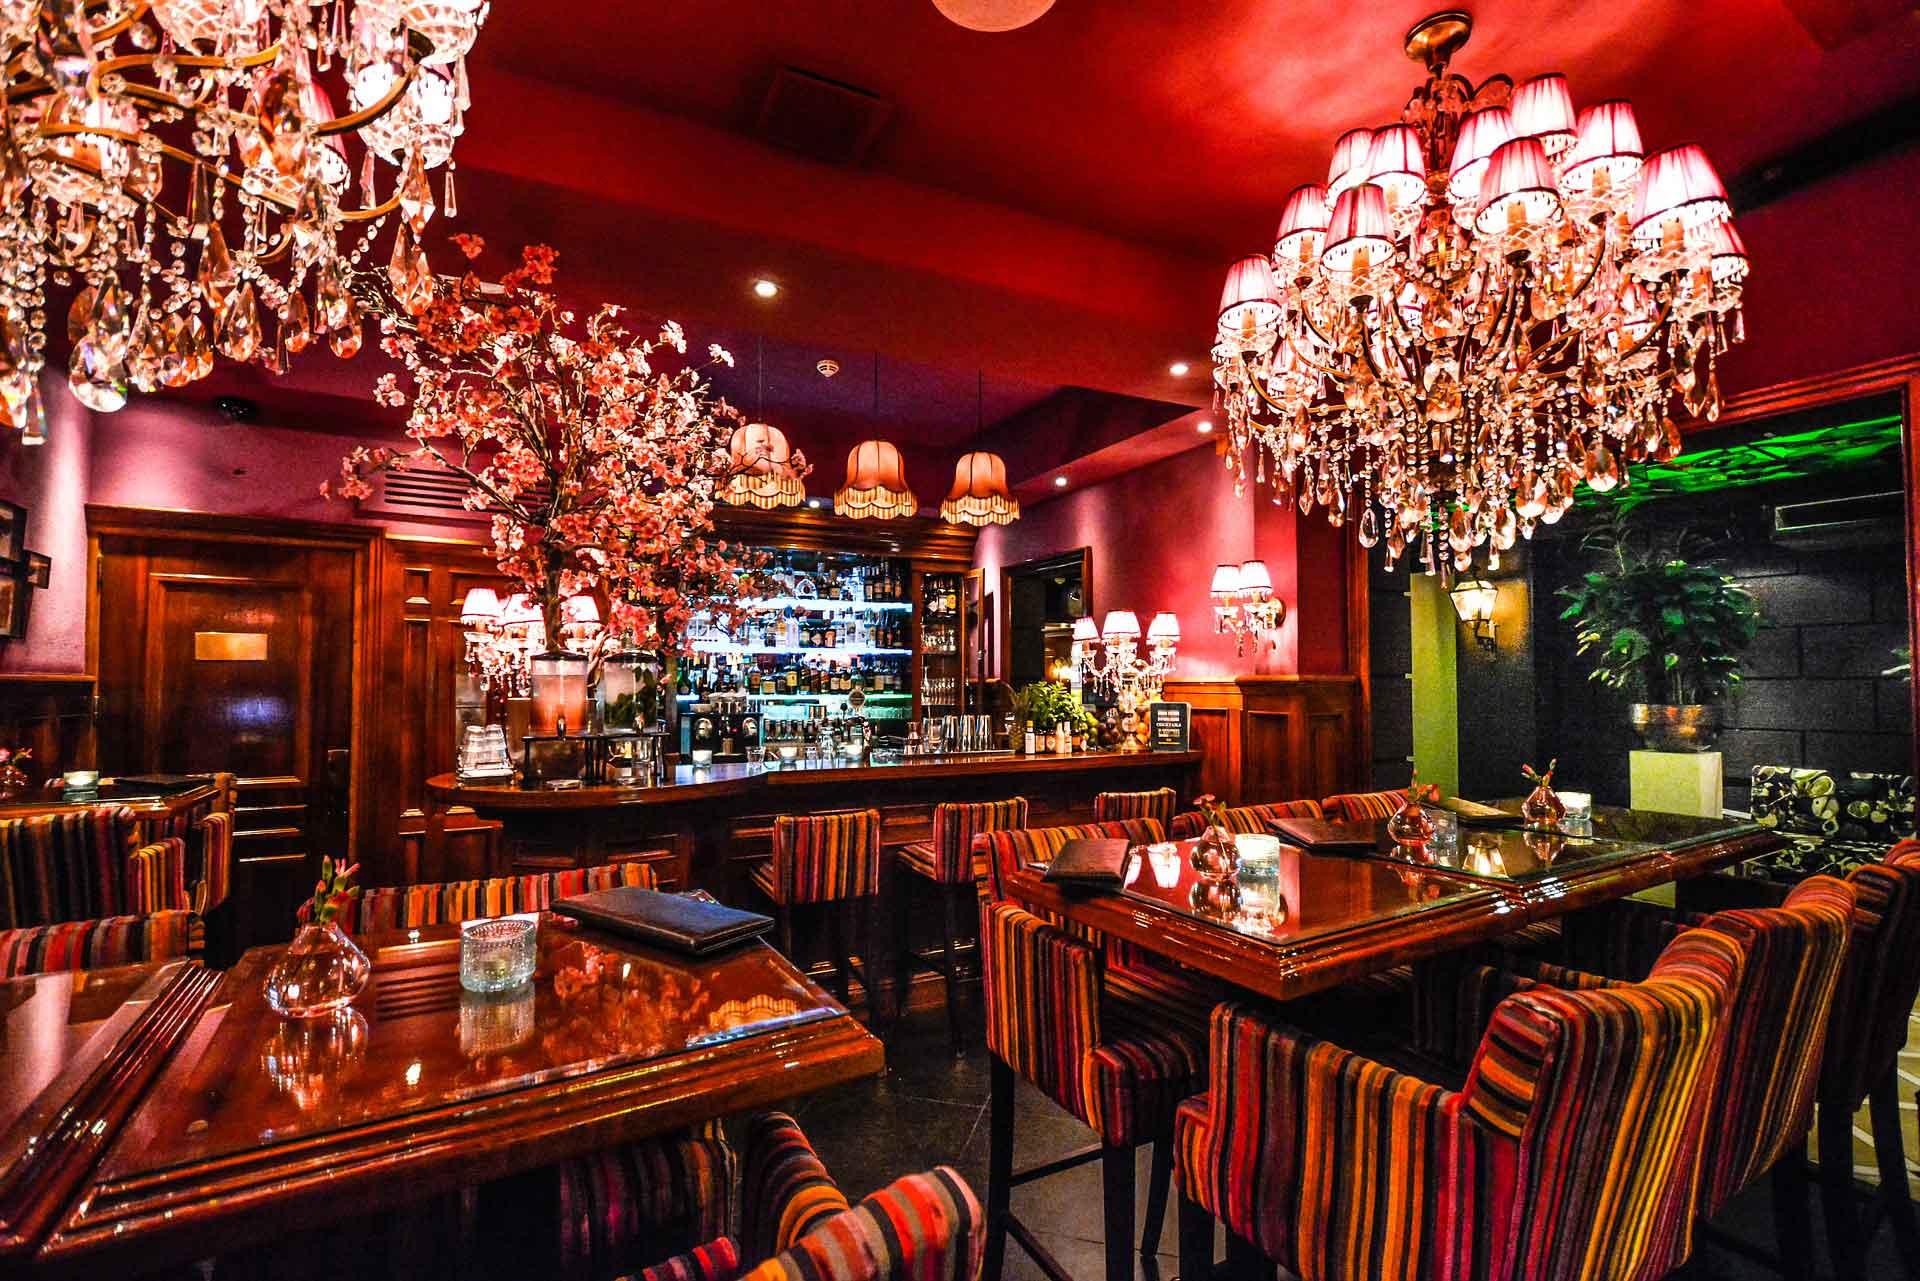 Bar Franchise For Sale in Brisbane by Interbiz Business Brokers